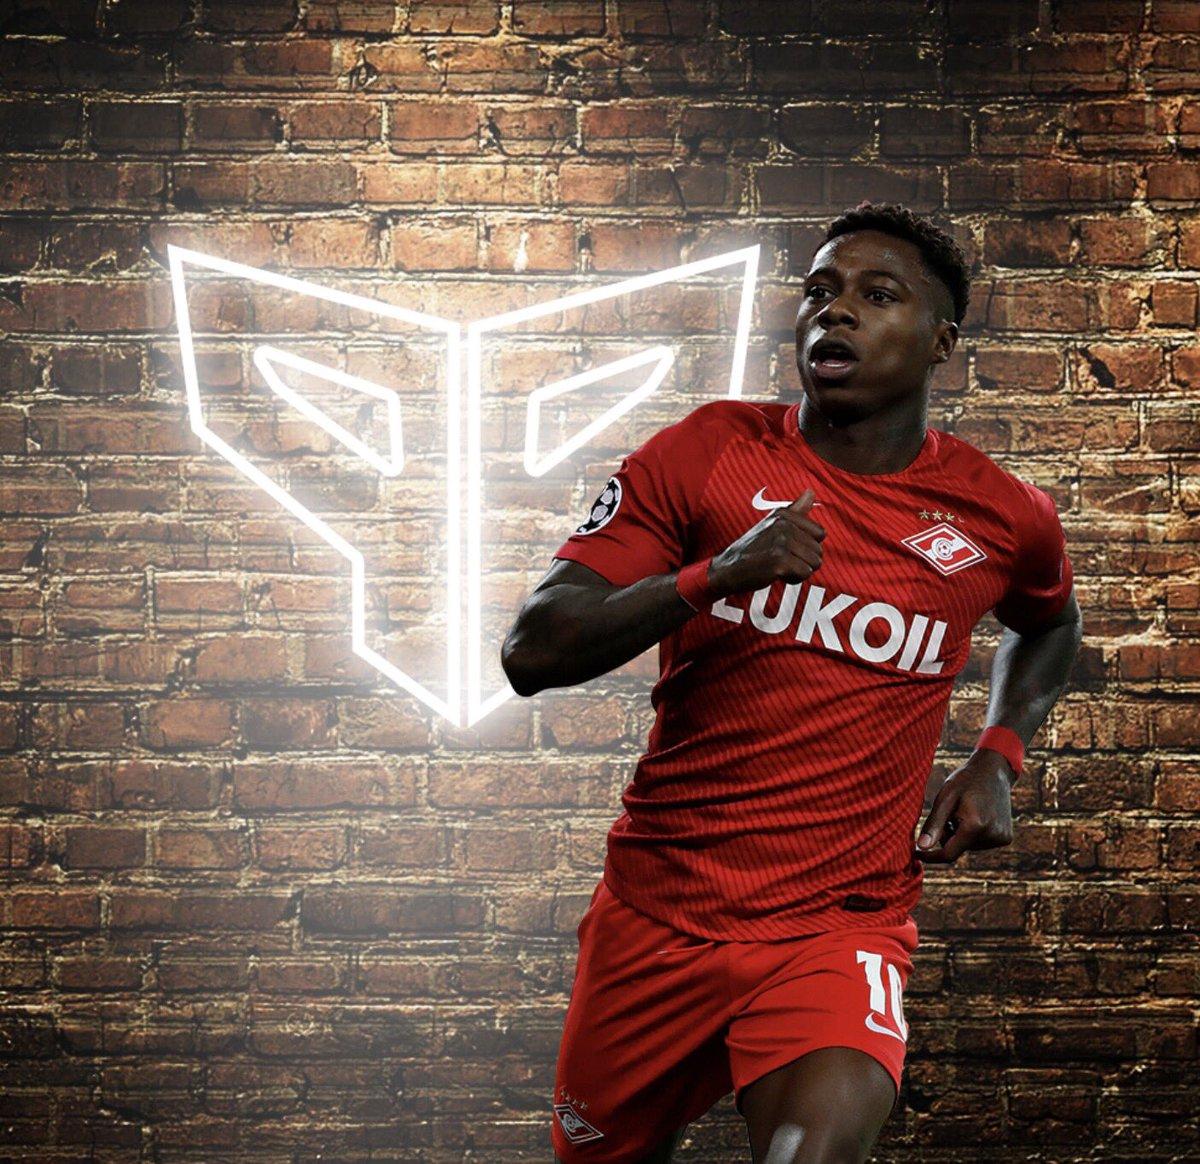 Lights on! Very important game tomorrow 🔴⚪️ #Spartak #QP10 https://t.co/cXJrXYUpLg